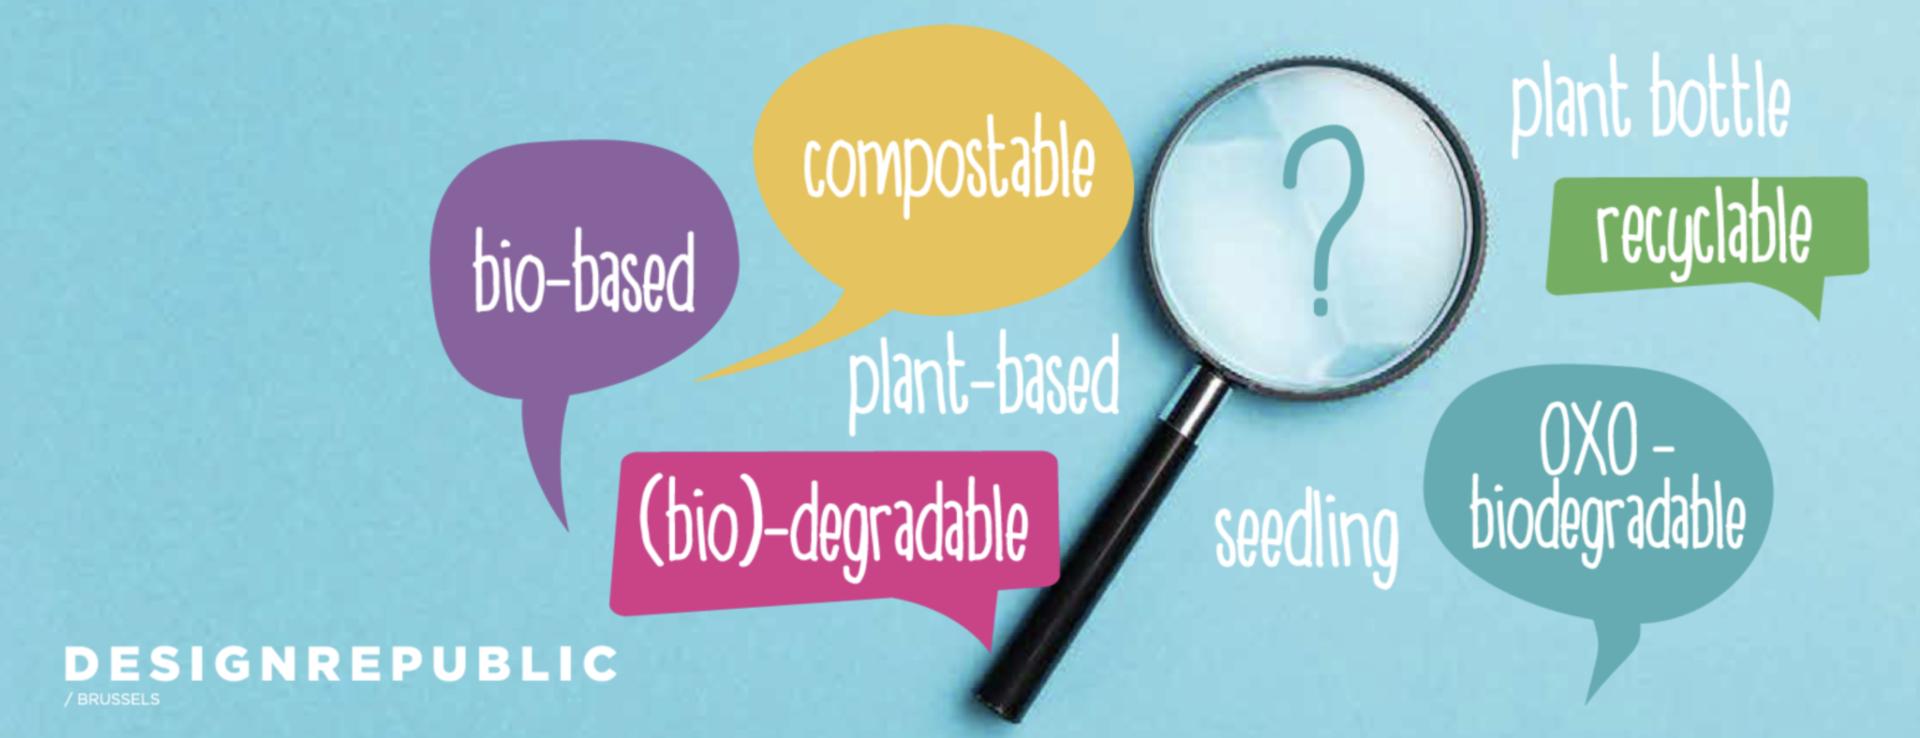 Sustainability is on top of DesignRepublic's mind